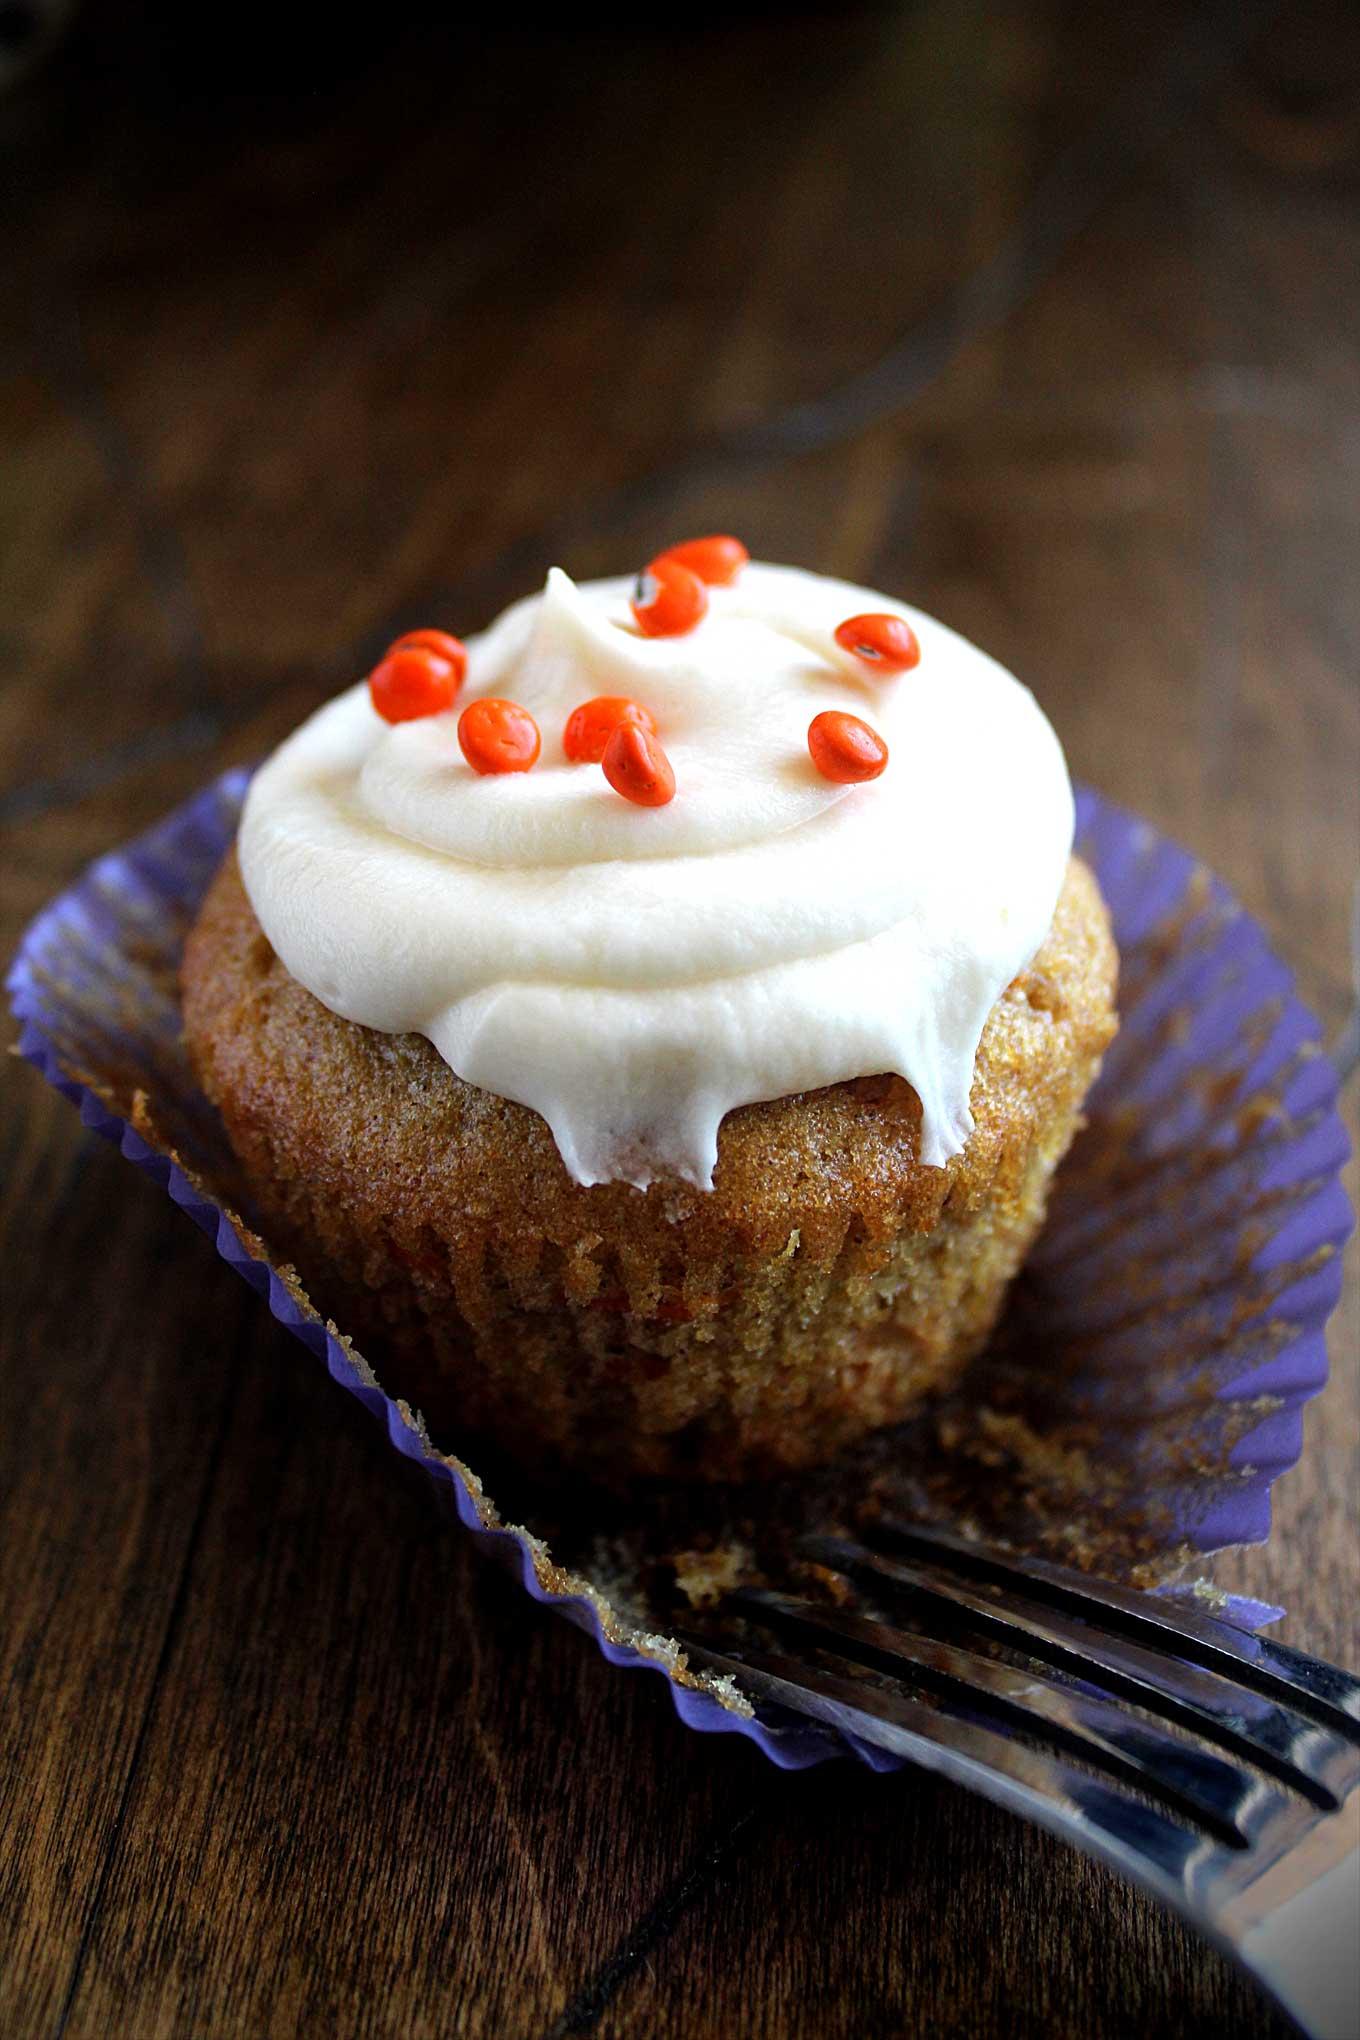 The Carrot Cake Catastrophe Recipe